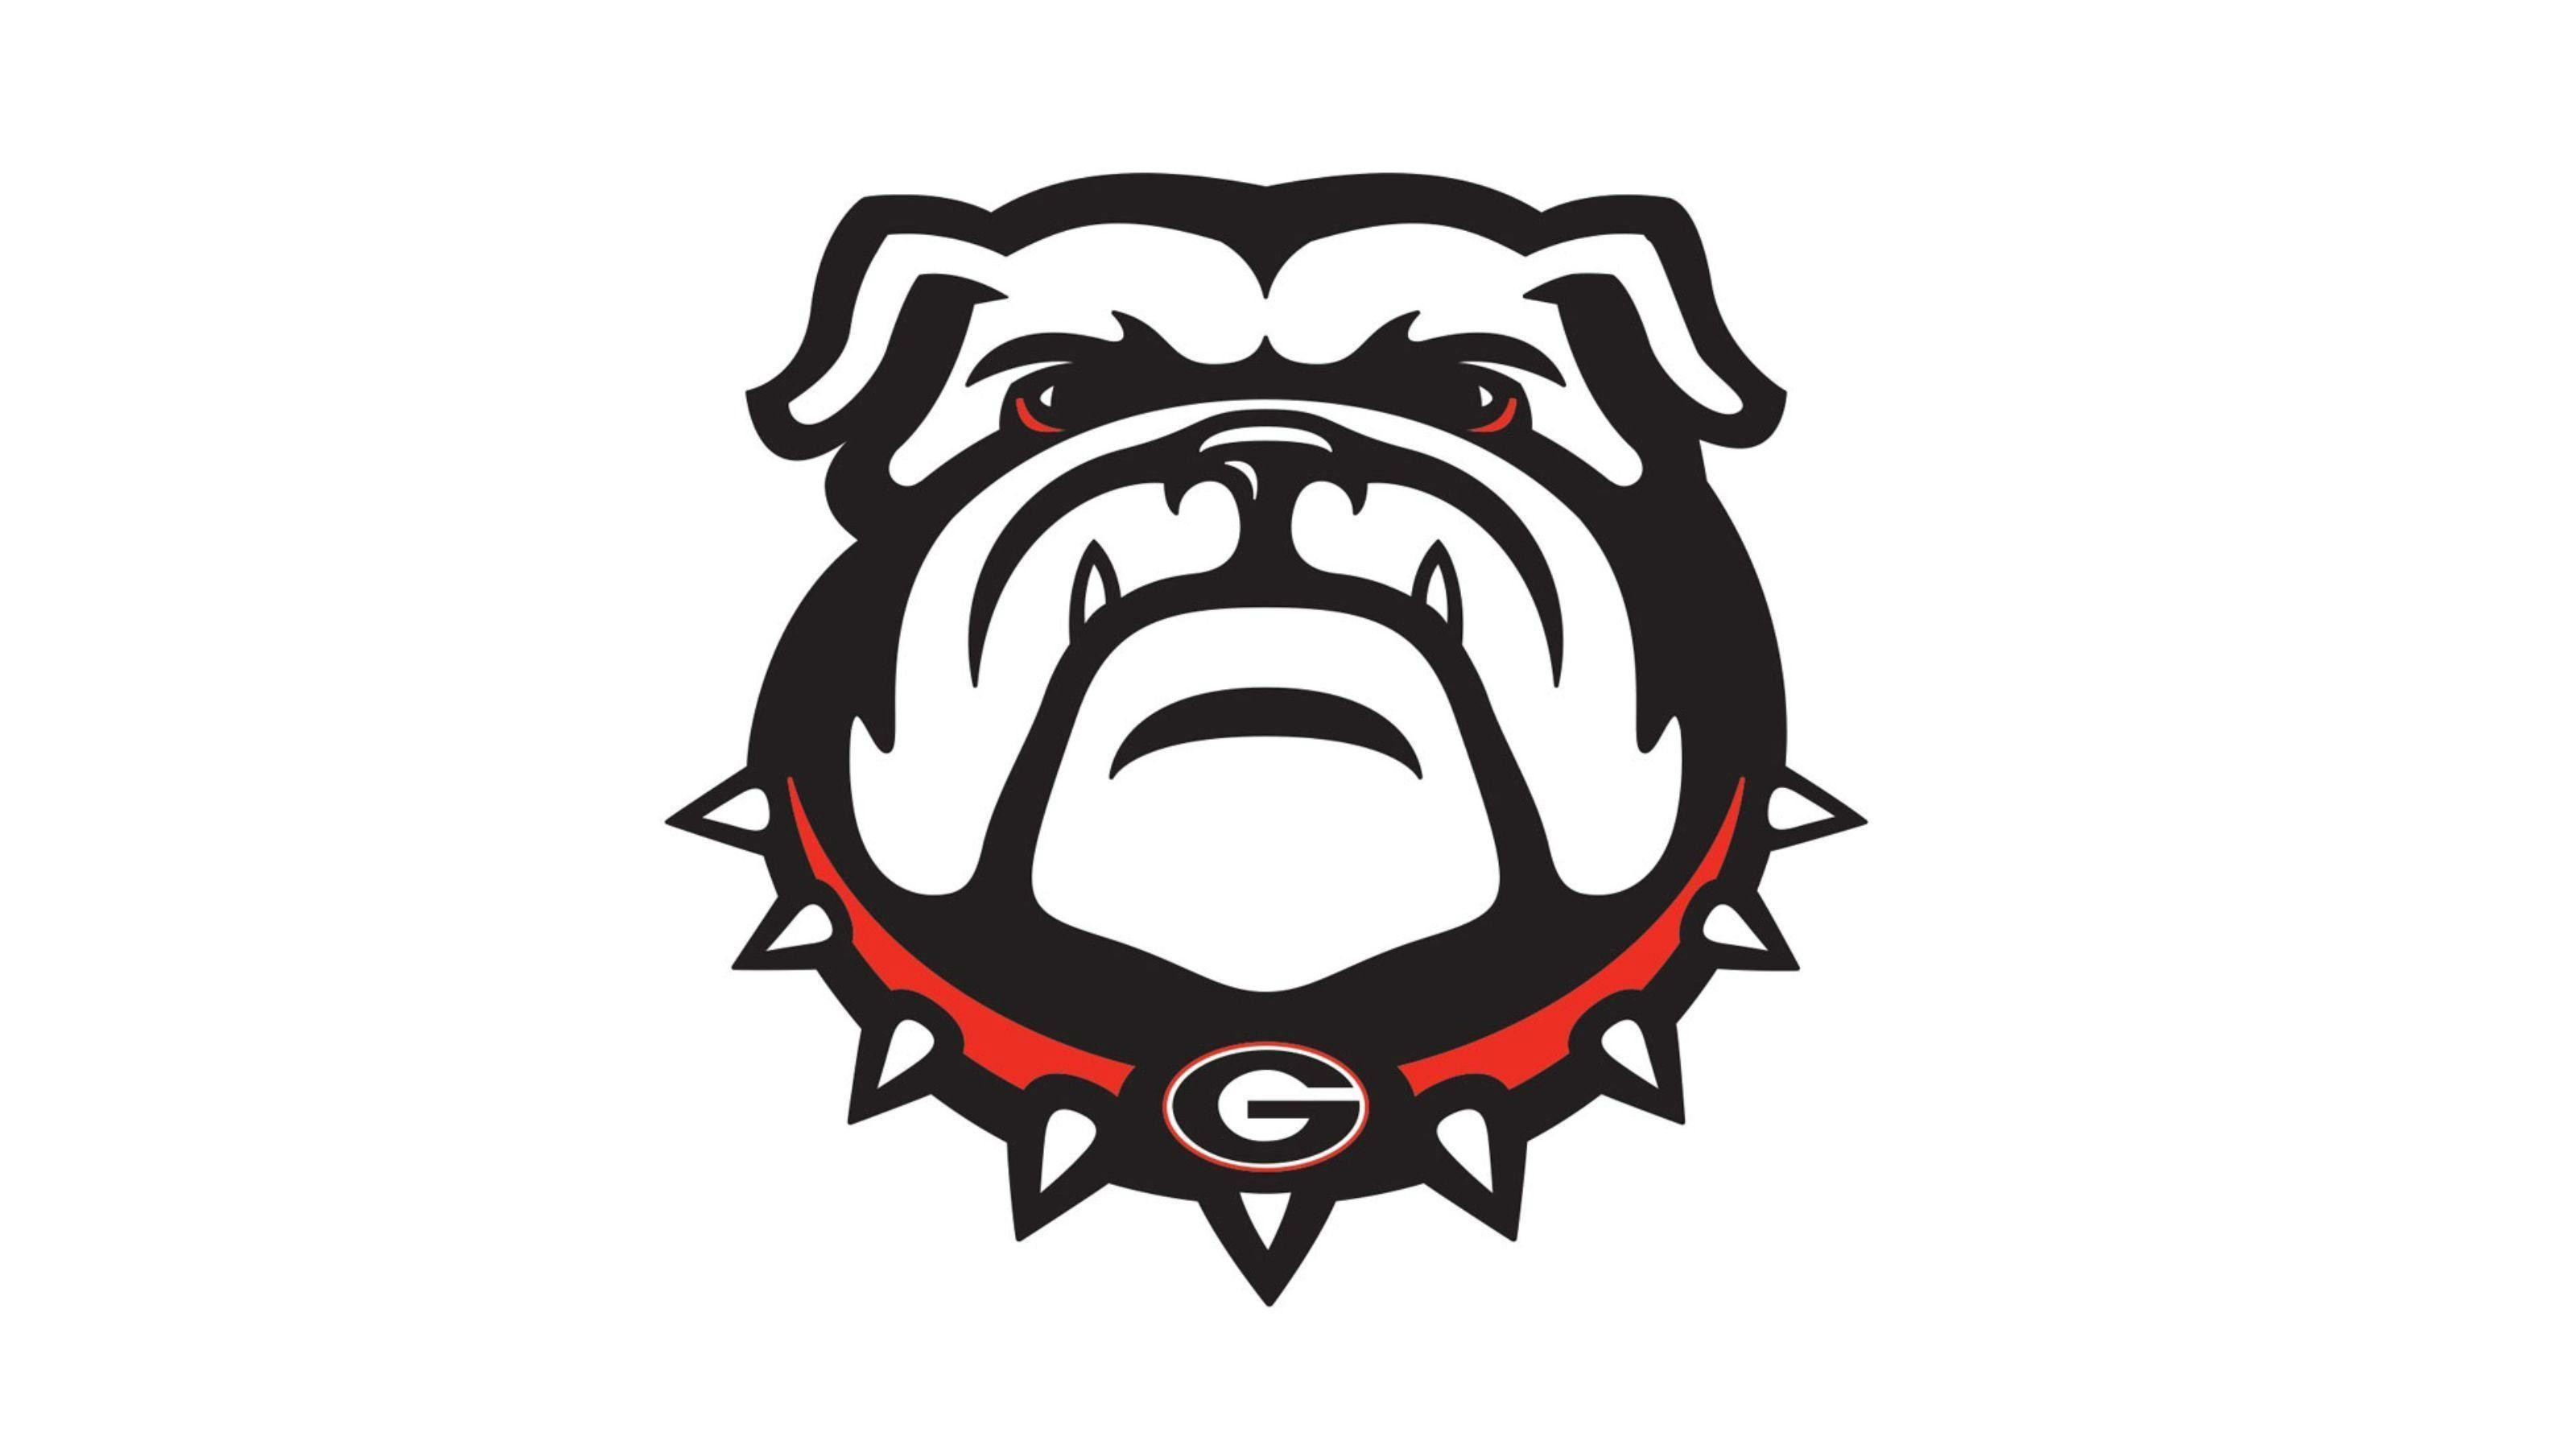 Georgia Bulldogs Wallpaper and